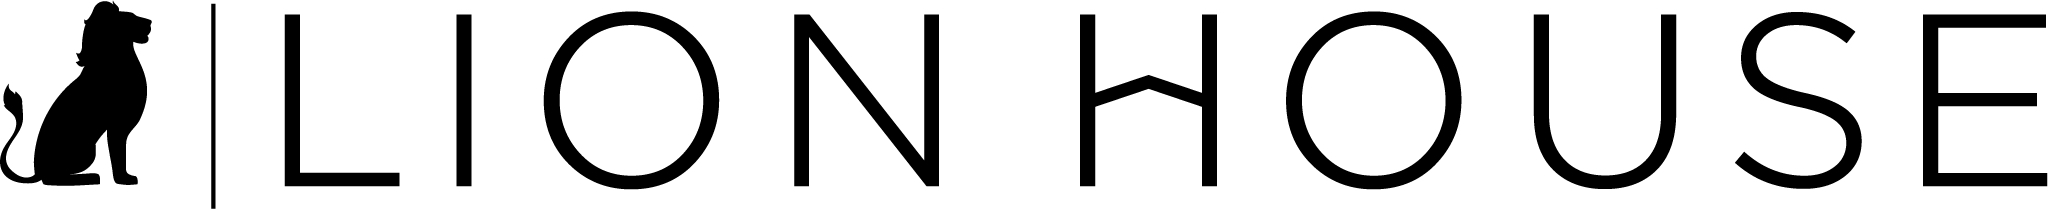 TLH_Logo_wLion_Black.jpg